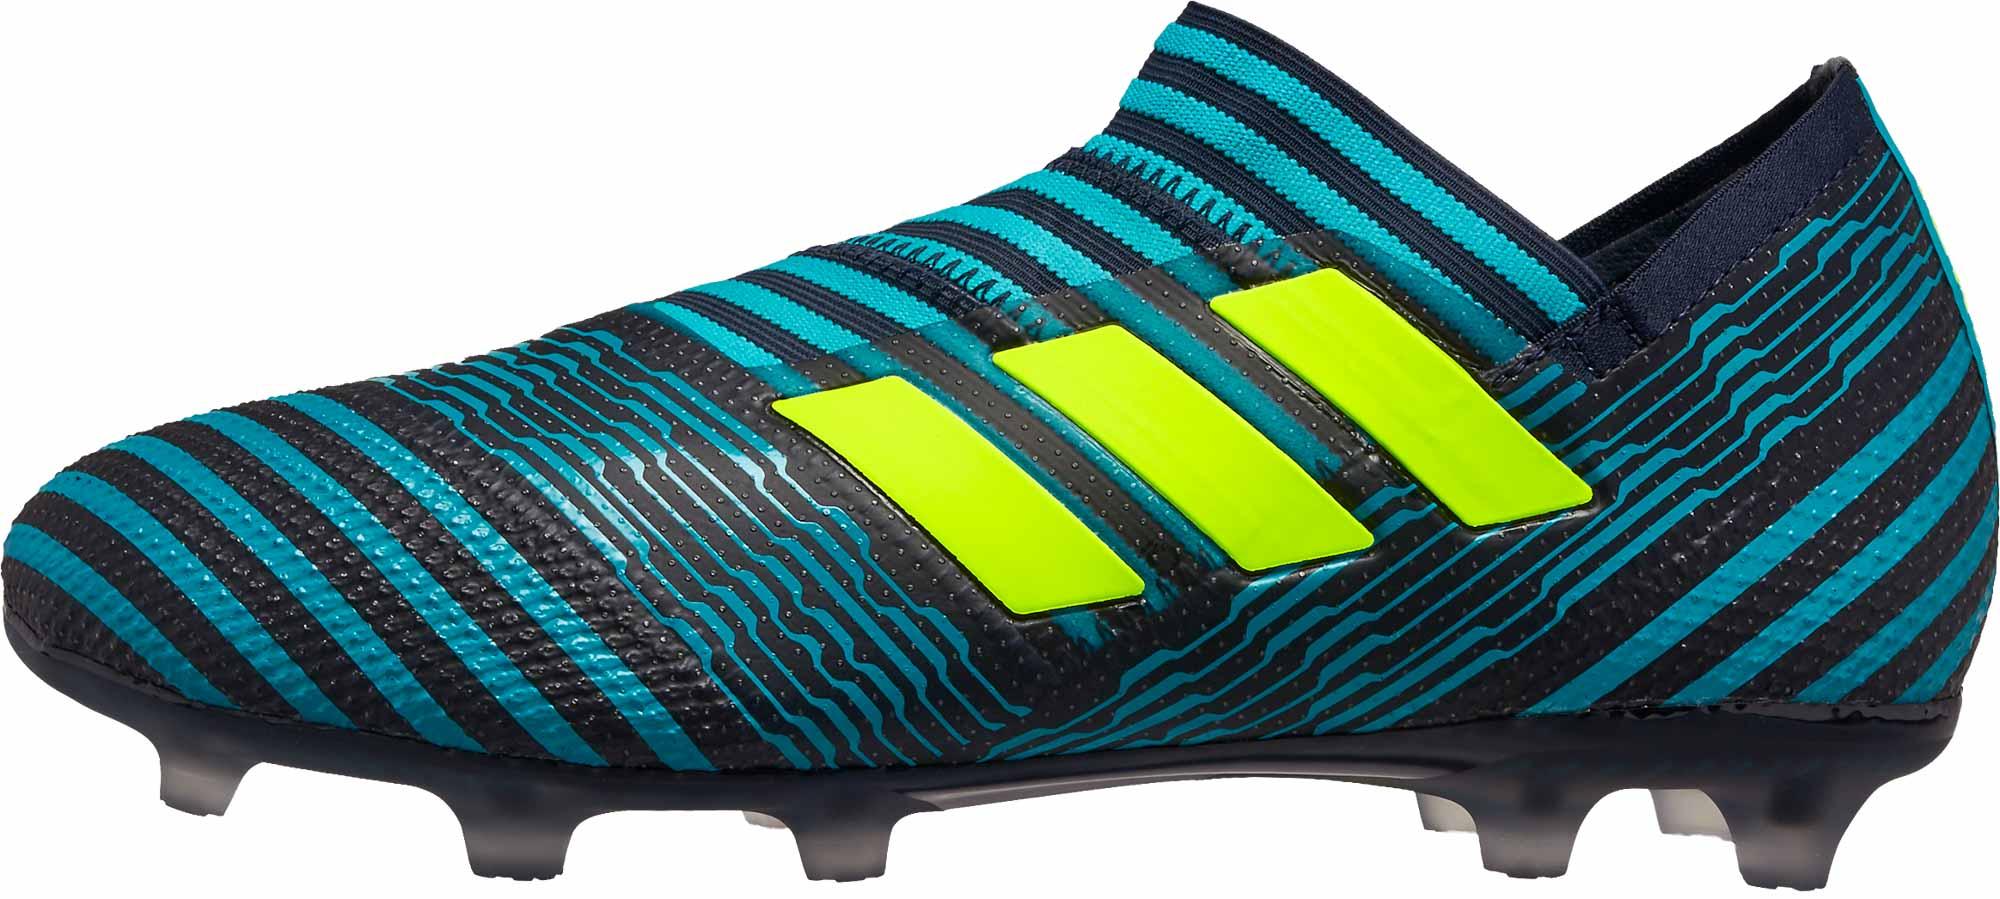 5c8a9e6d5 Kids adidas Nemeziz 17+ 360Agility FG Soccer Cleats - Legend Ink ...